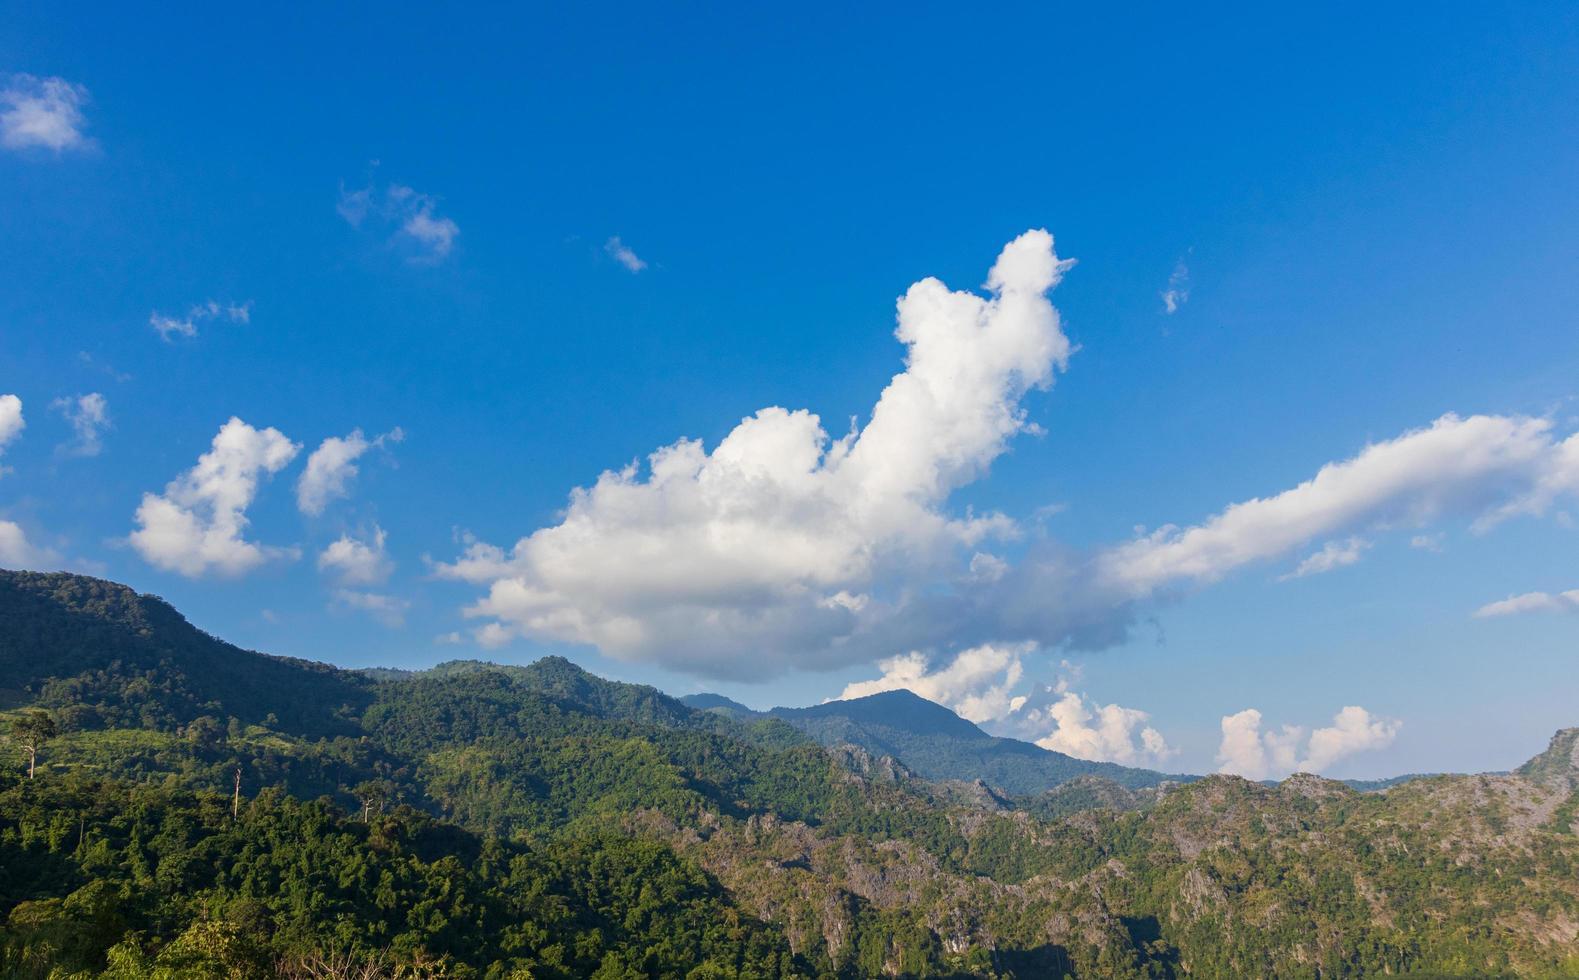 montagne e cielo blu foto